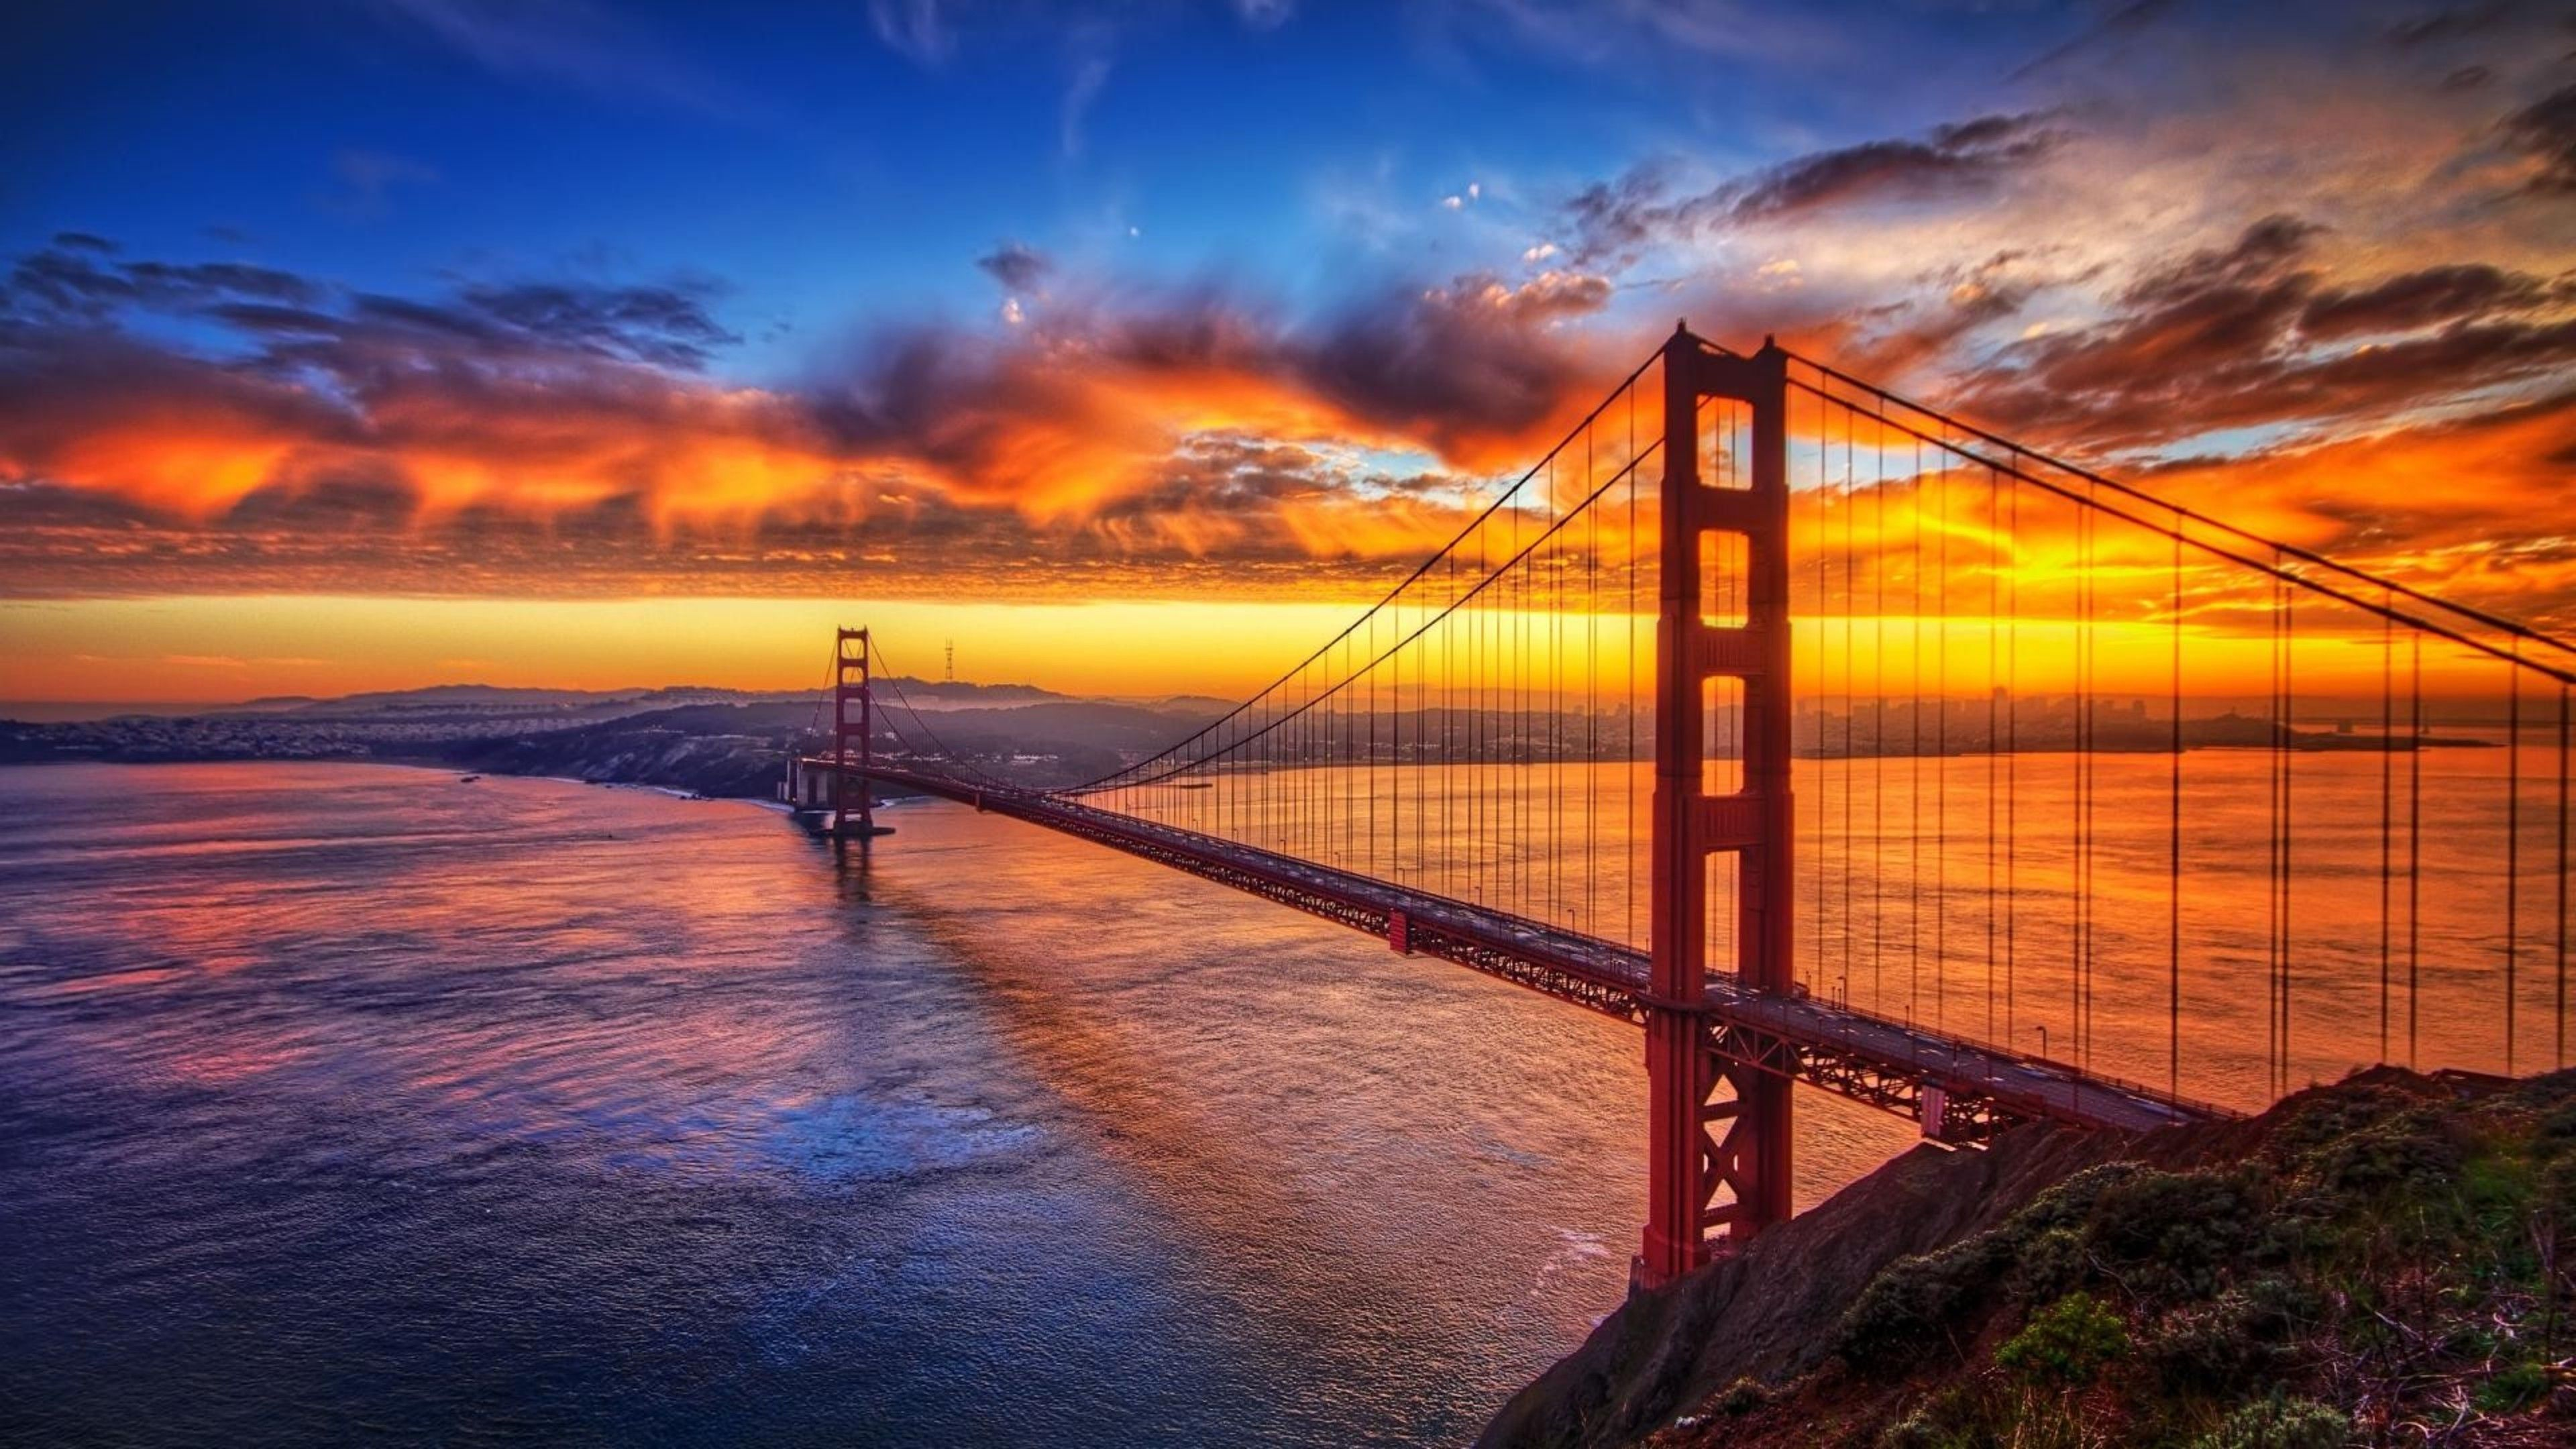 Bridge Sunset Sky 4k Sunset Wallpapers Sky Wallpapers Nature Wallpapers Bridge Wallpapers Bridge Wallpaper Sunset Sky Golden Gate Bridge Hd wallpaper sunset sky red bridge